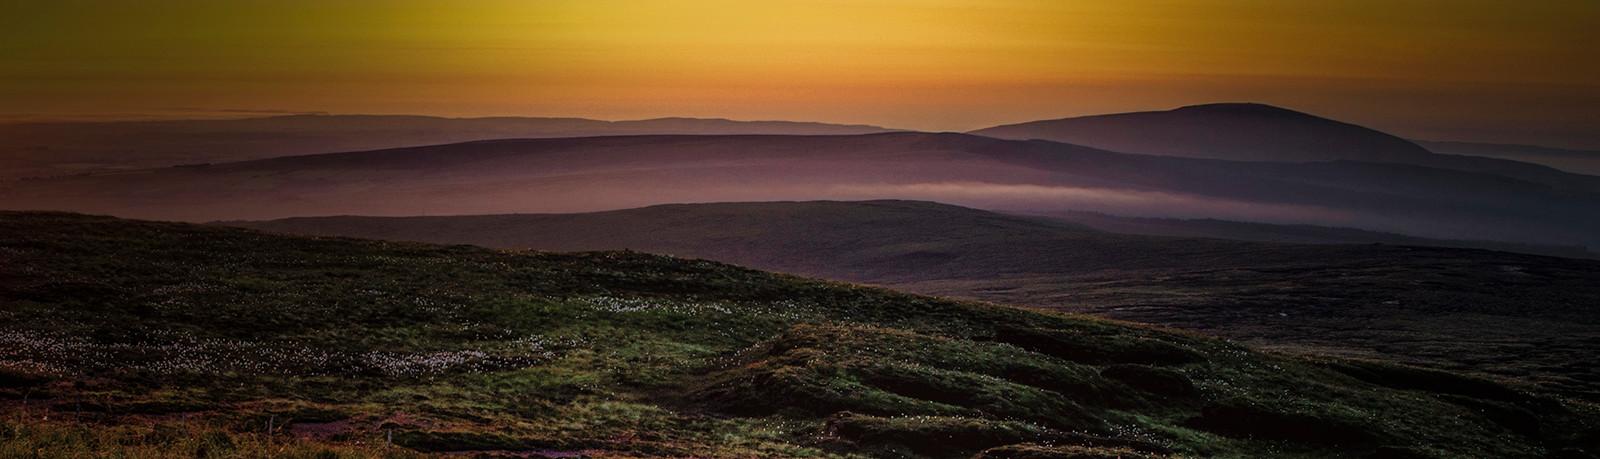 COLOUR - Misty Landscape by Dessy Coyles (9 marks)